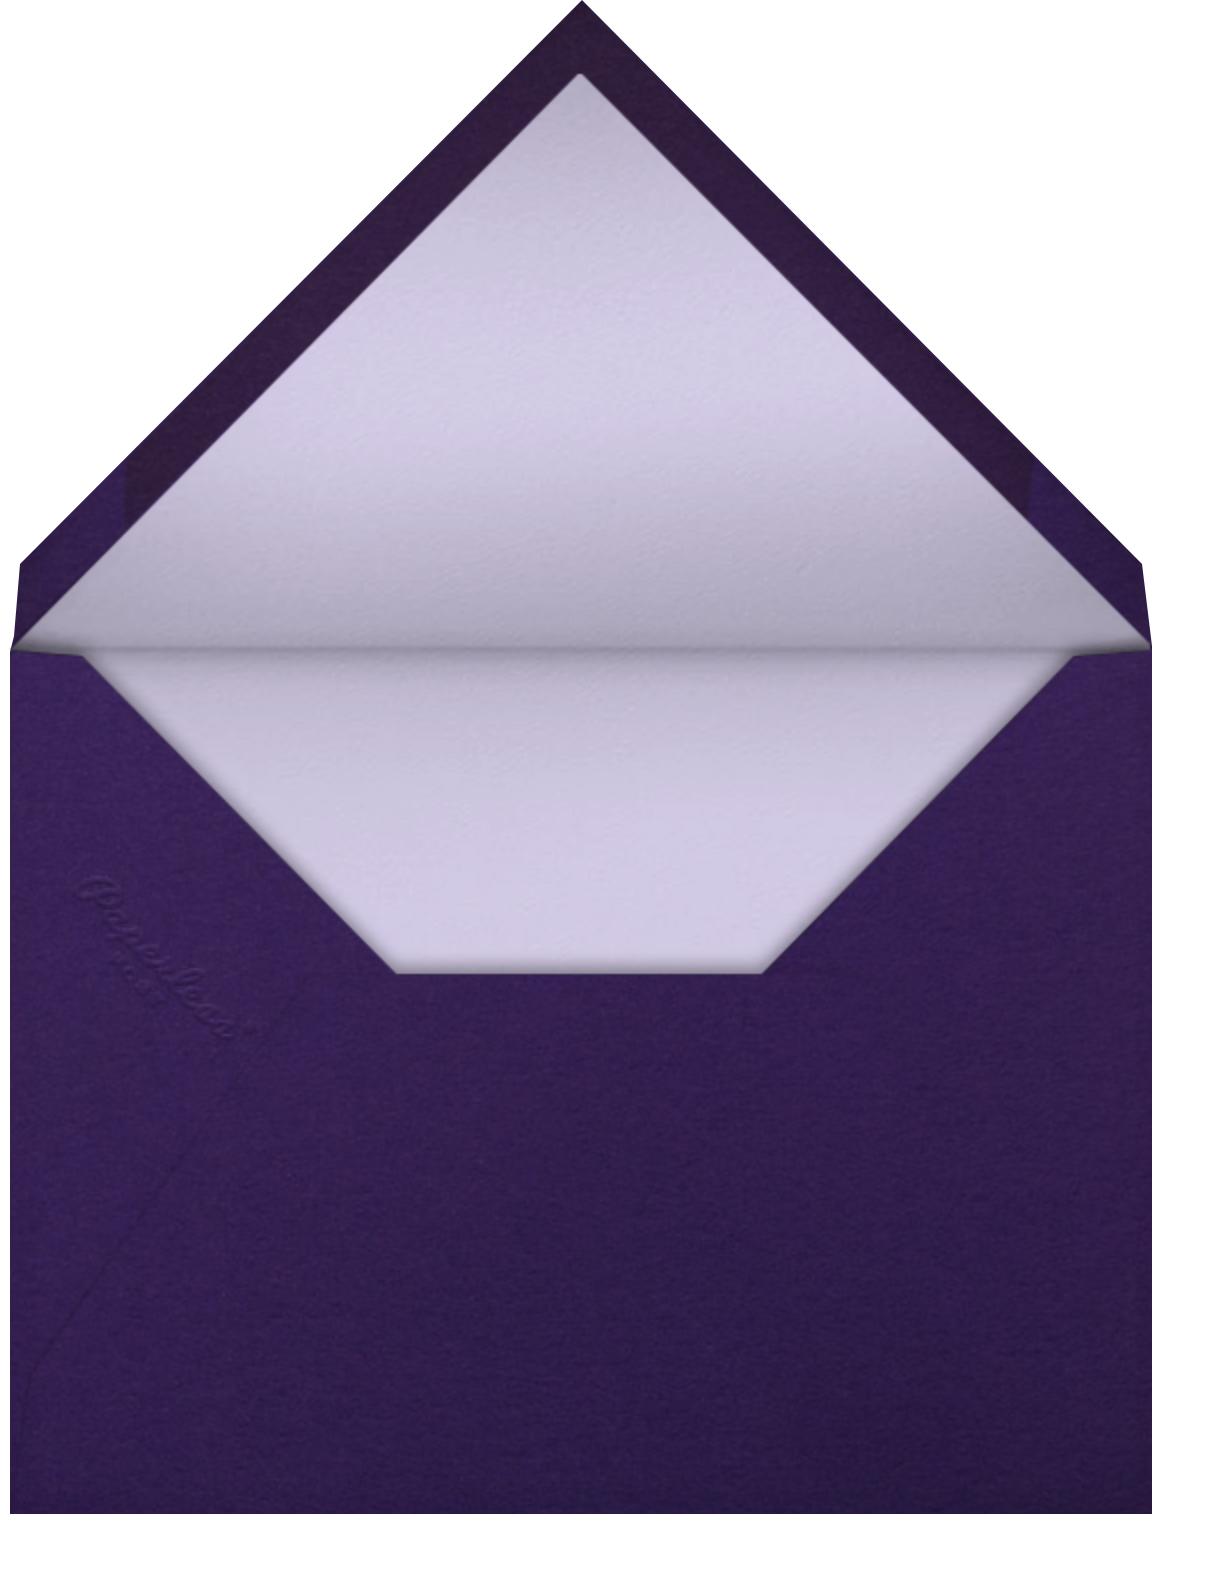 Mitzvah Marquee (Purple) - Bat  - Paperless Post - Envelope